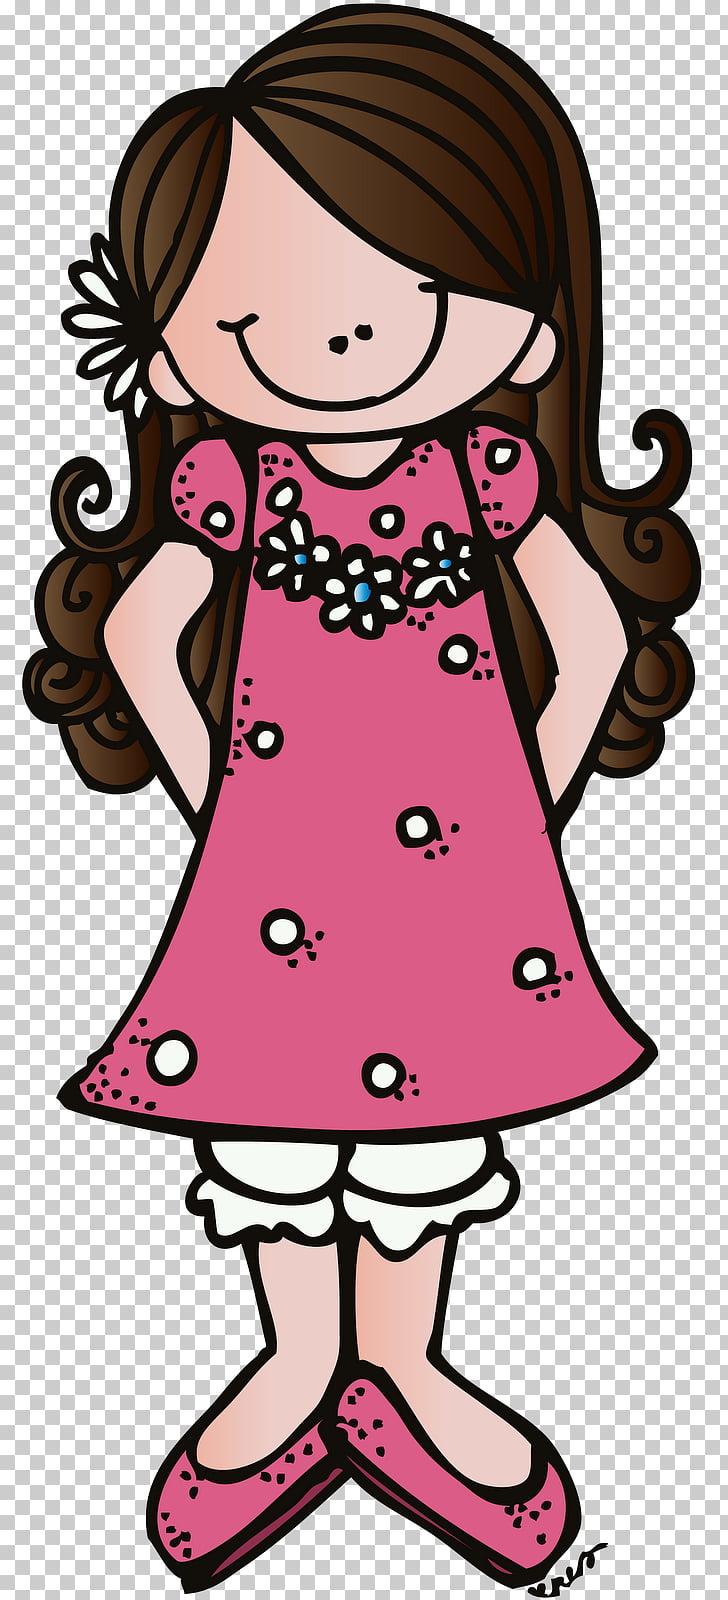 medium resolution of drawing google student teacher melonheadz s png clipart